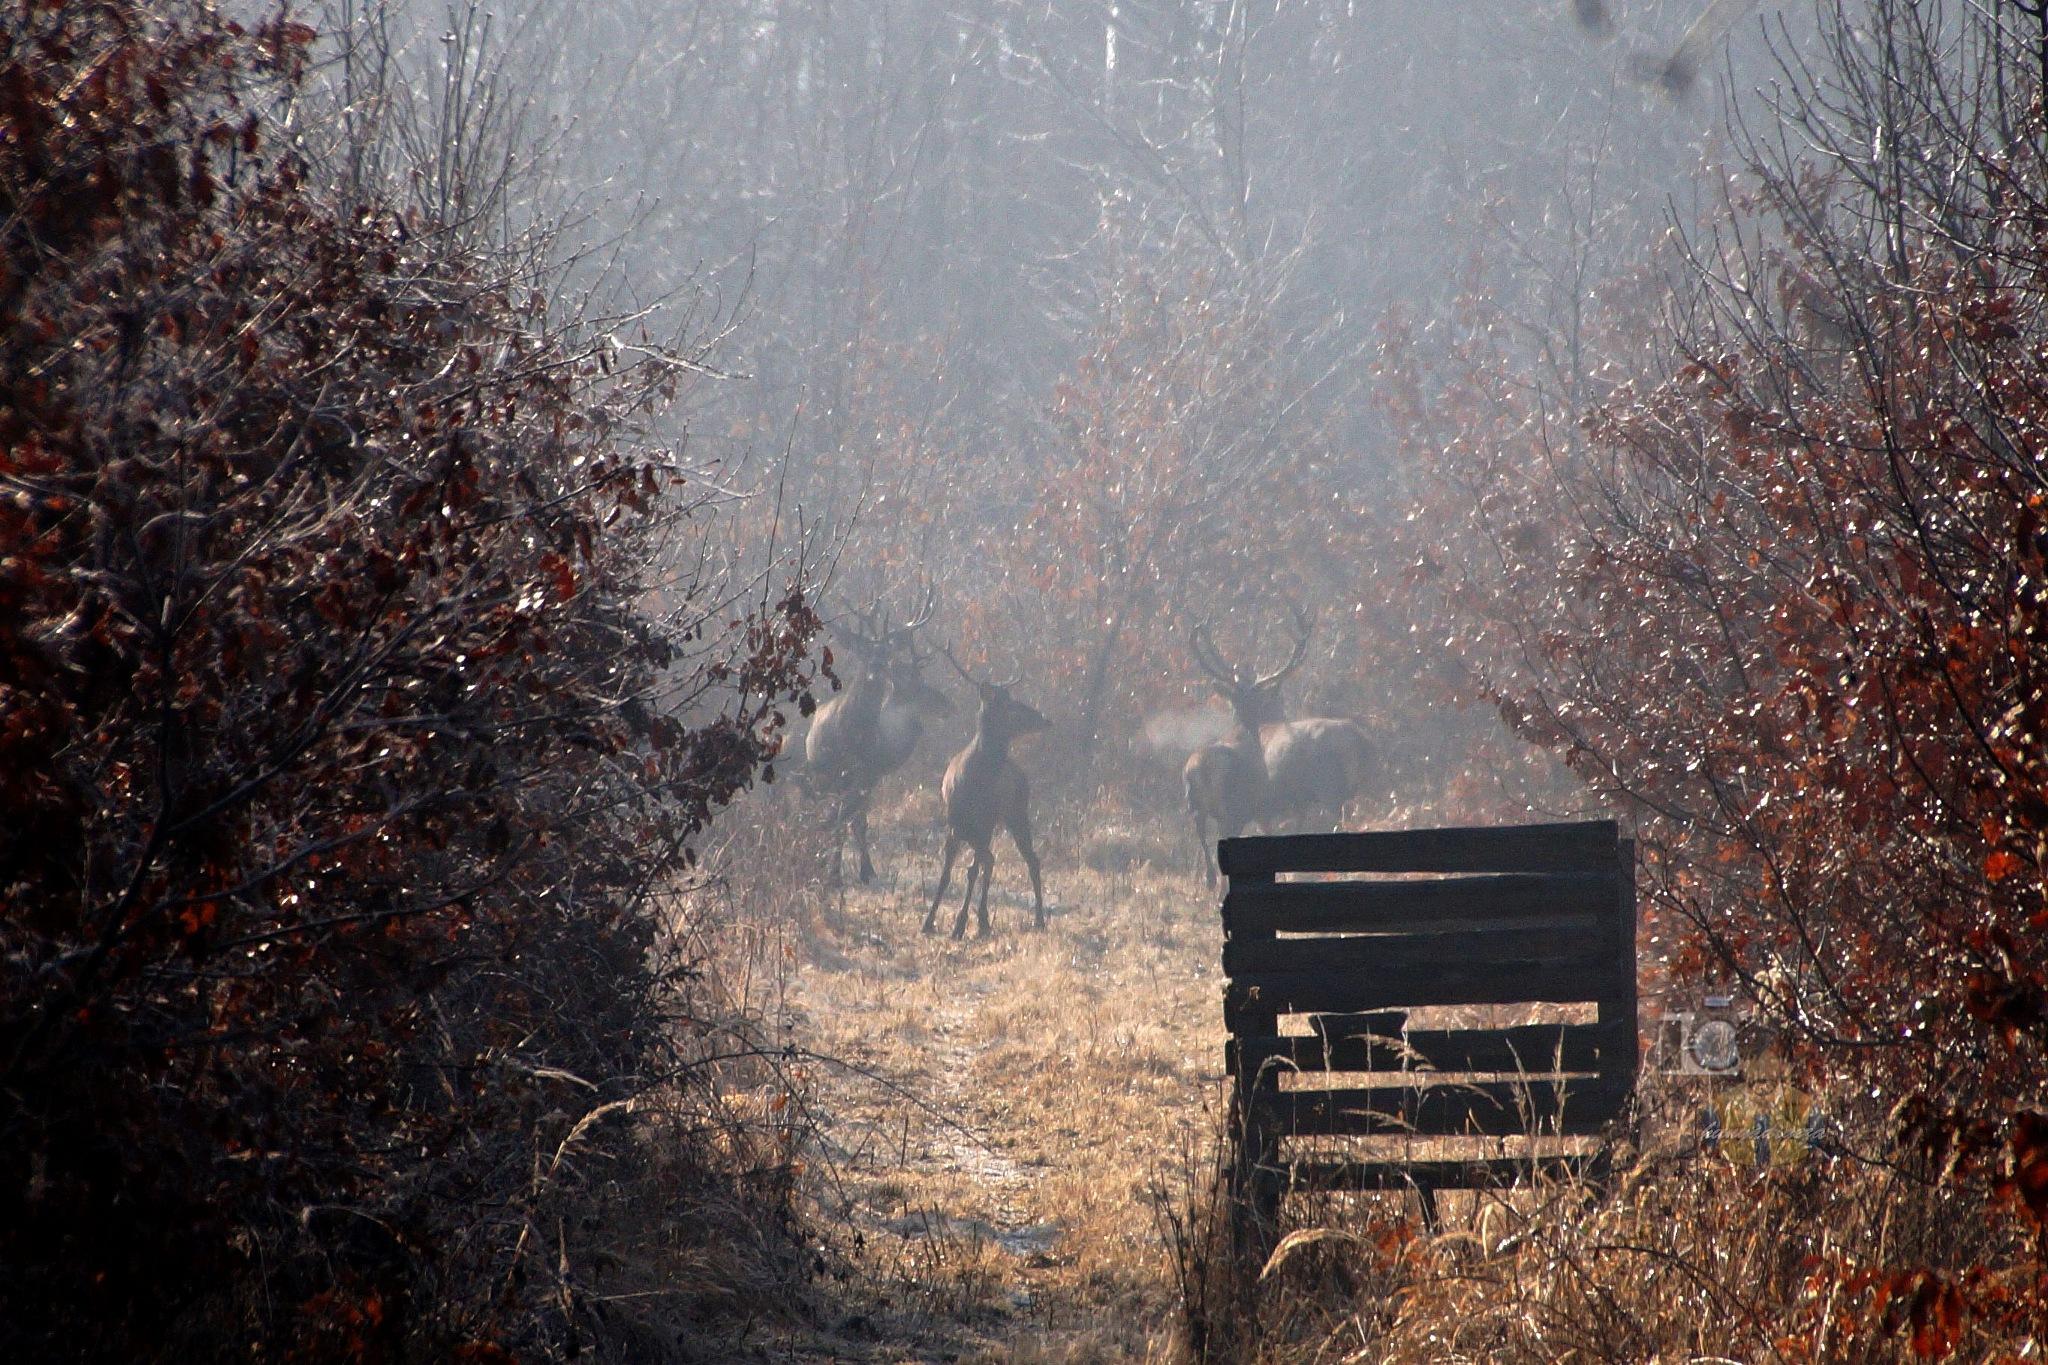 Febr.14, red deers in frosty morning sunshine by hunyadigeza